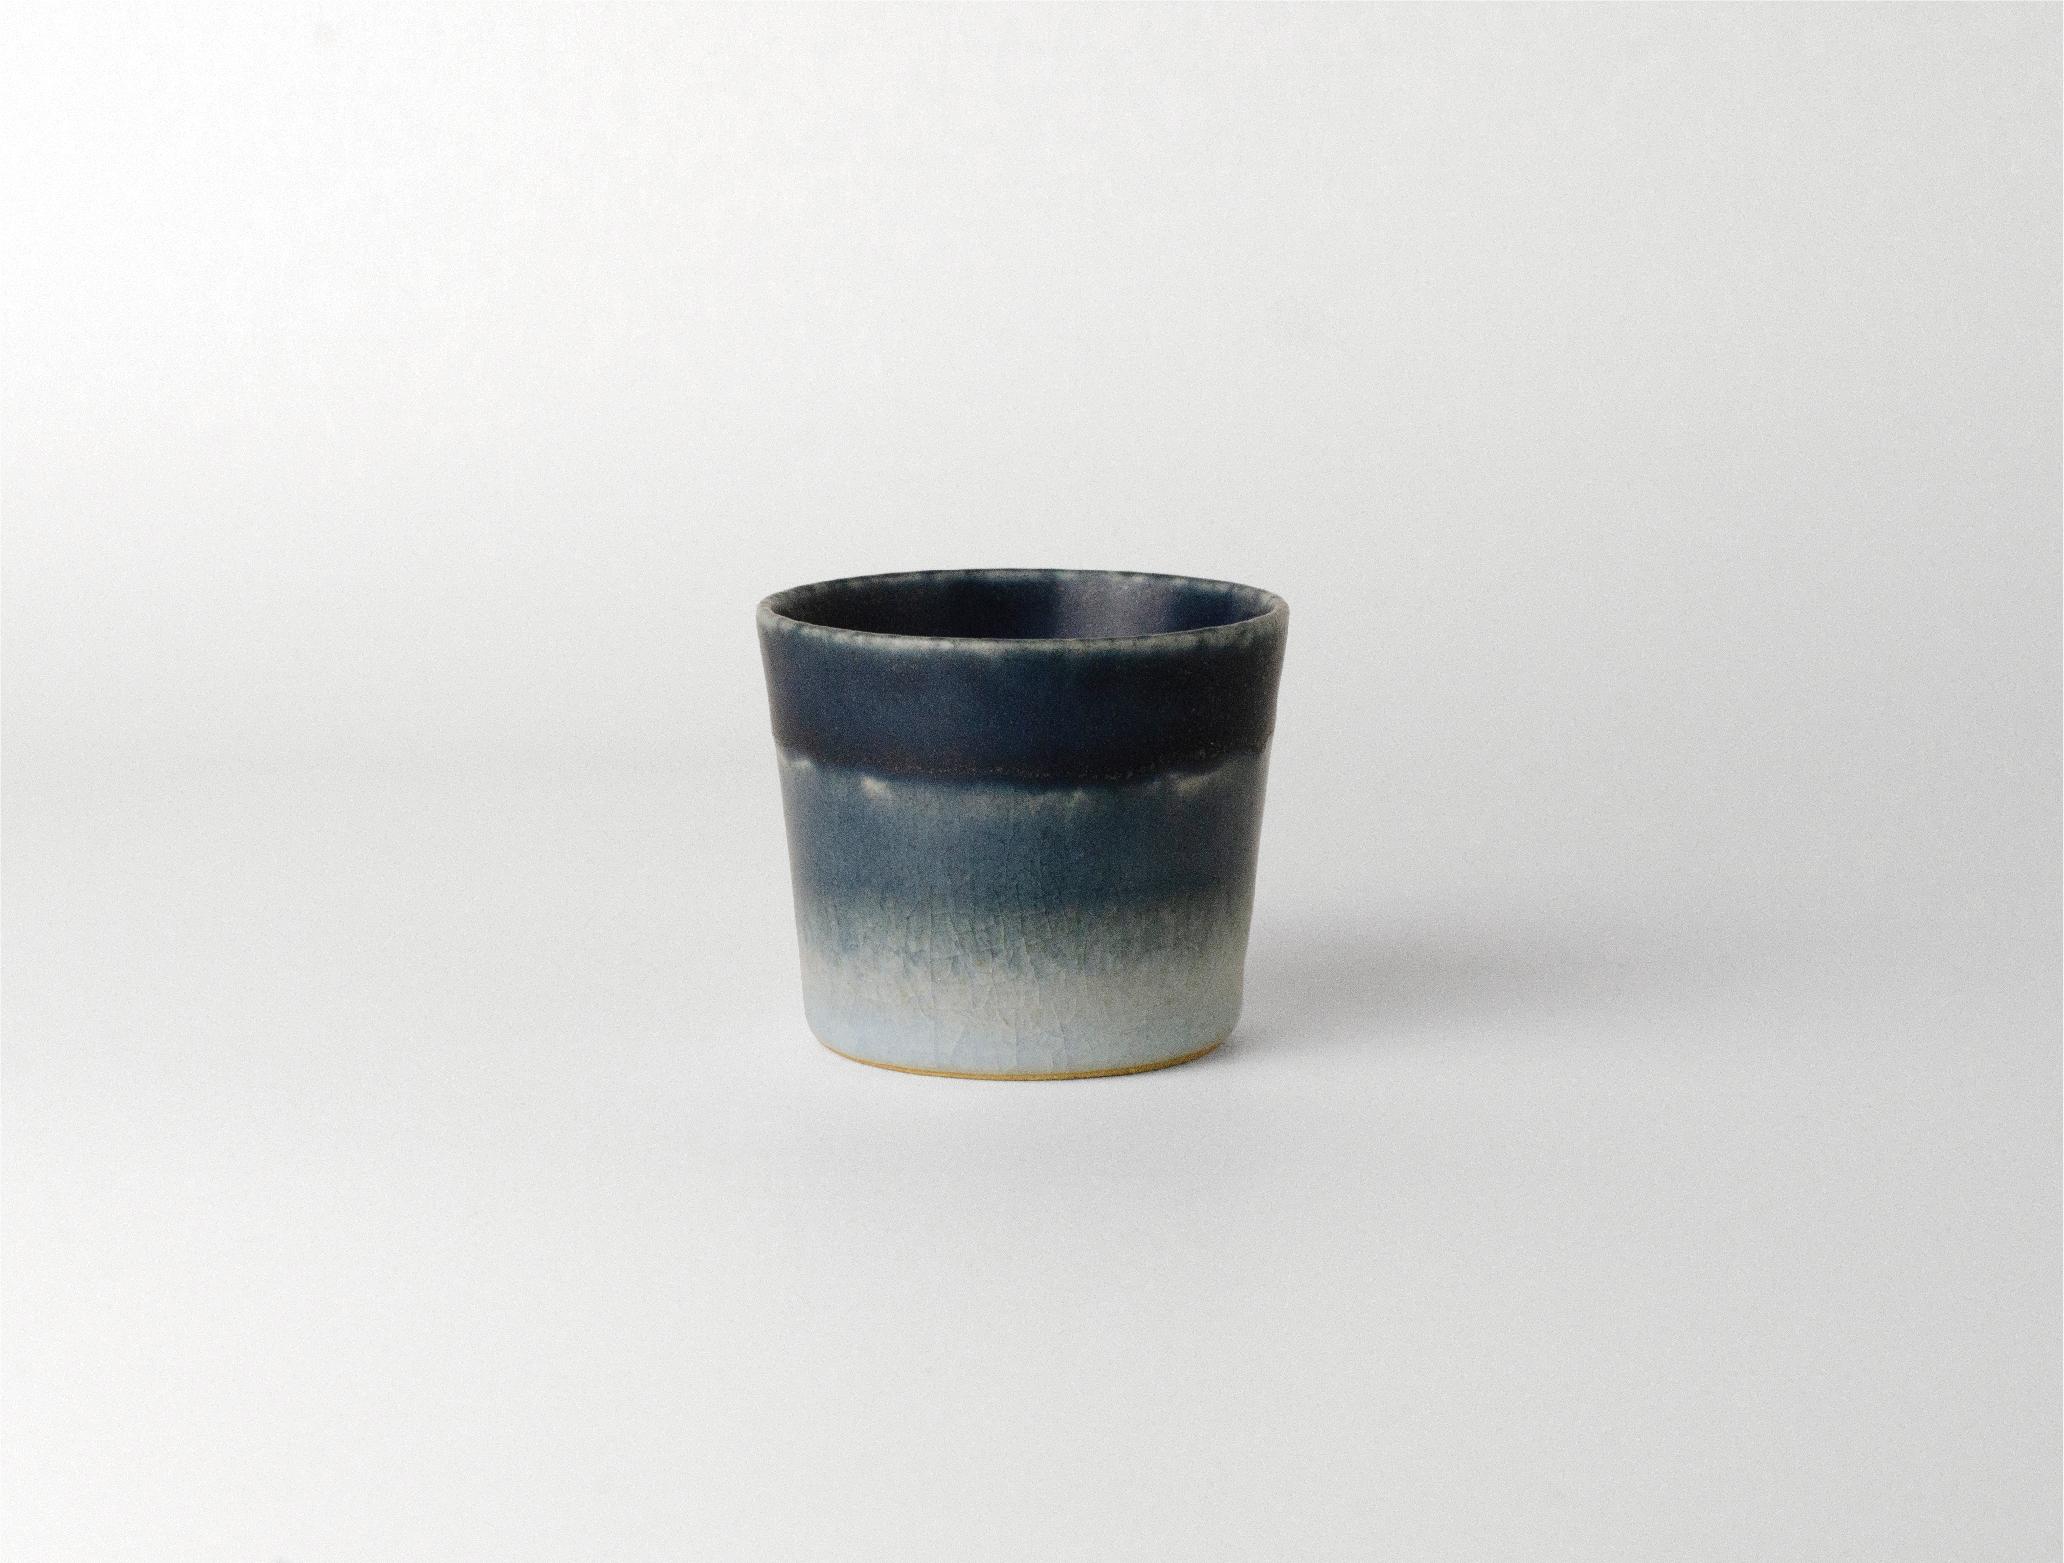 Fujisan_fuyu 60mlカップ イメージ